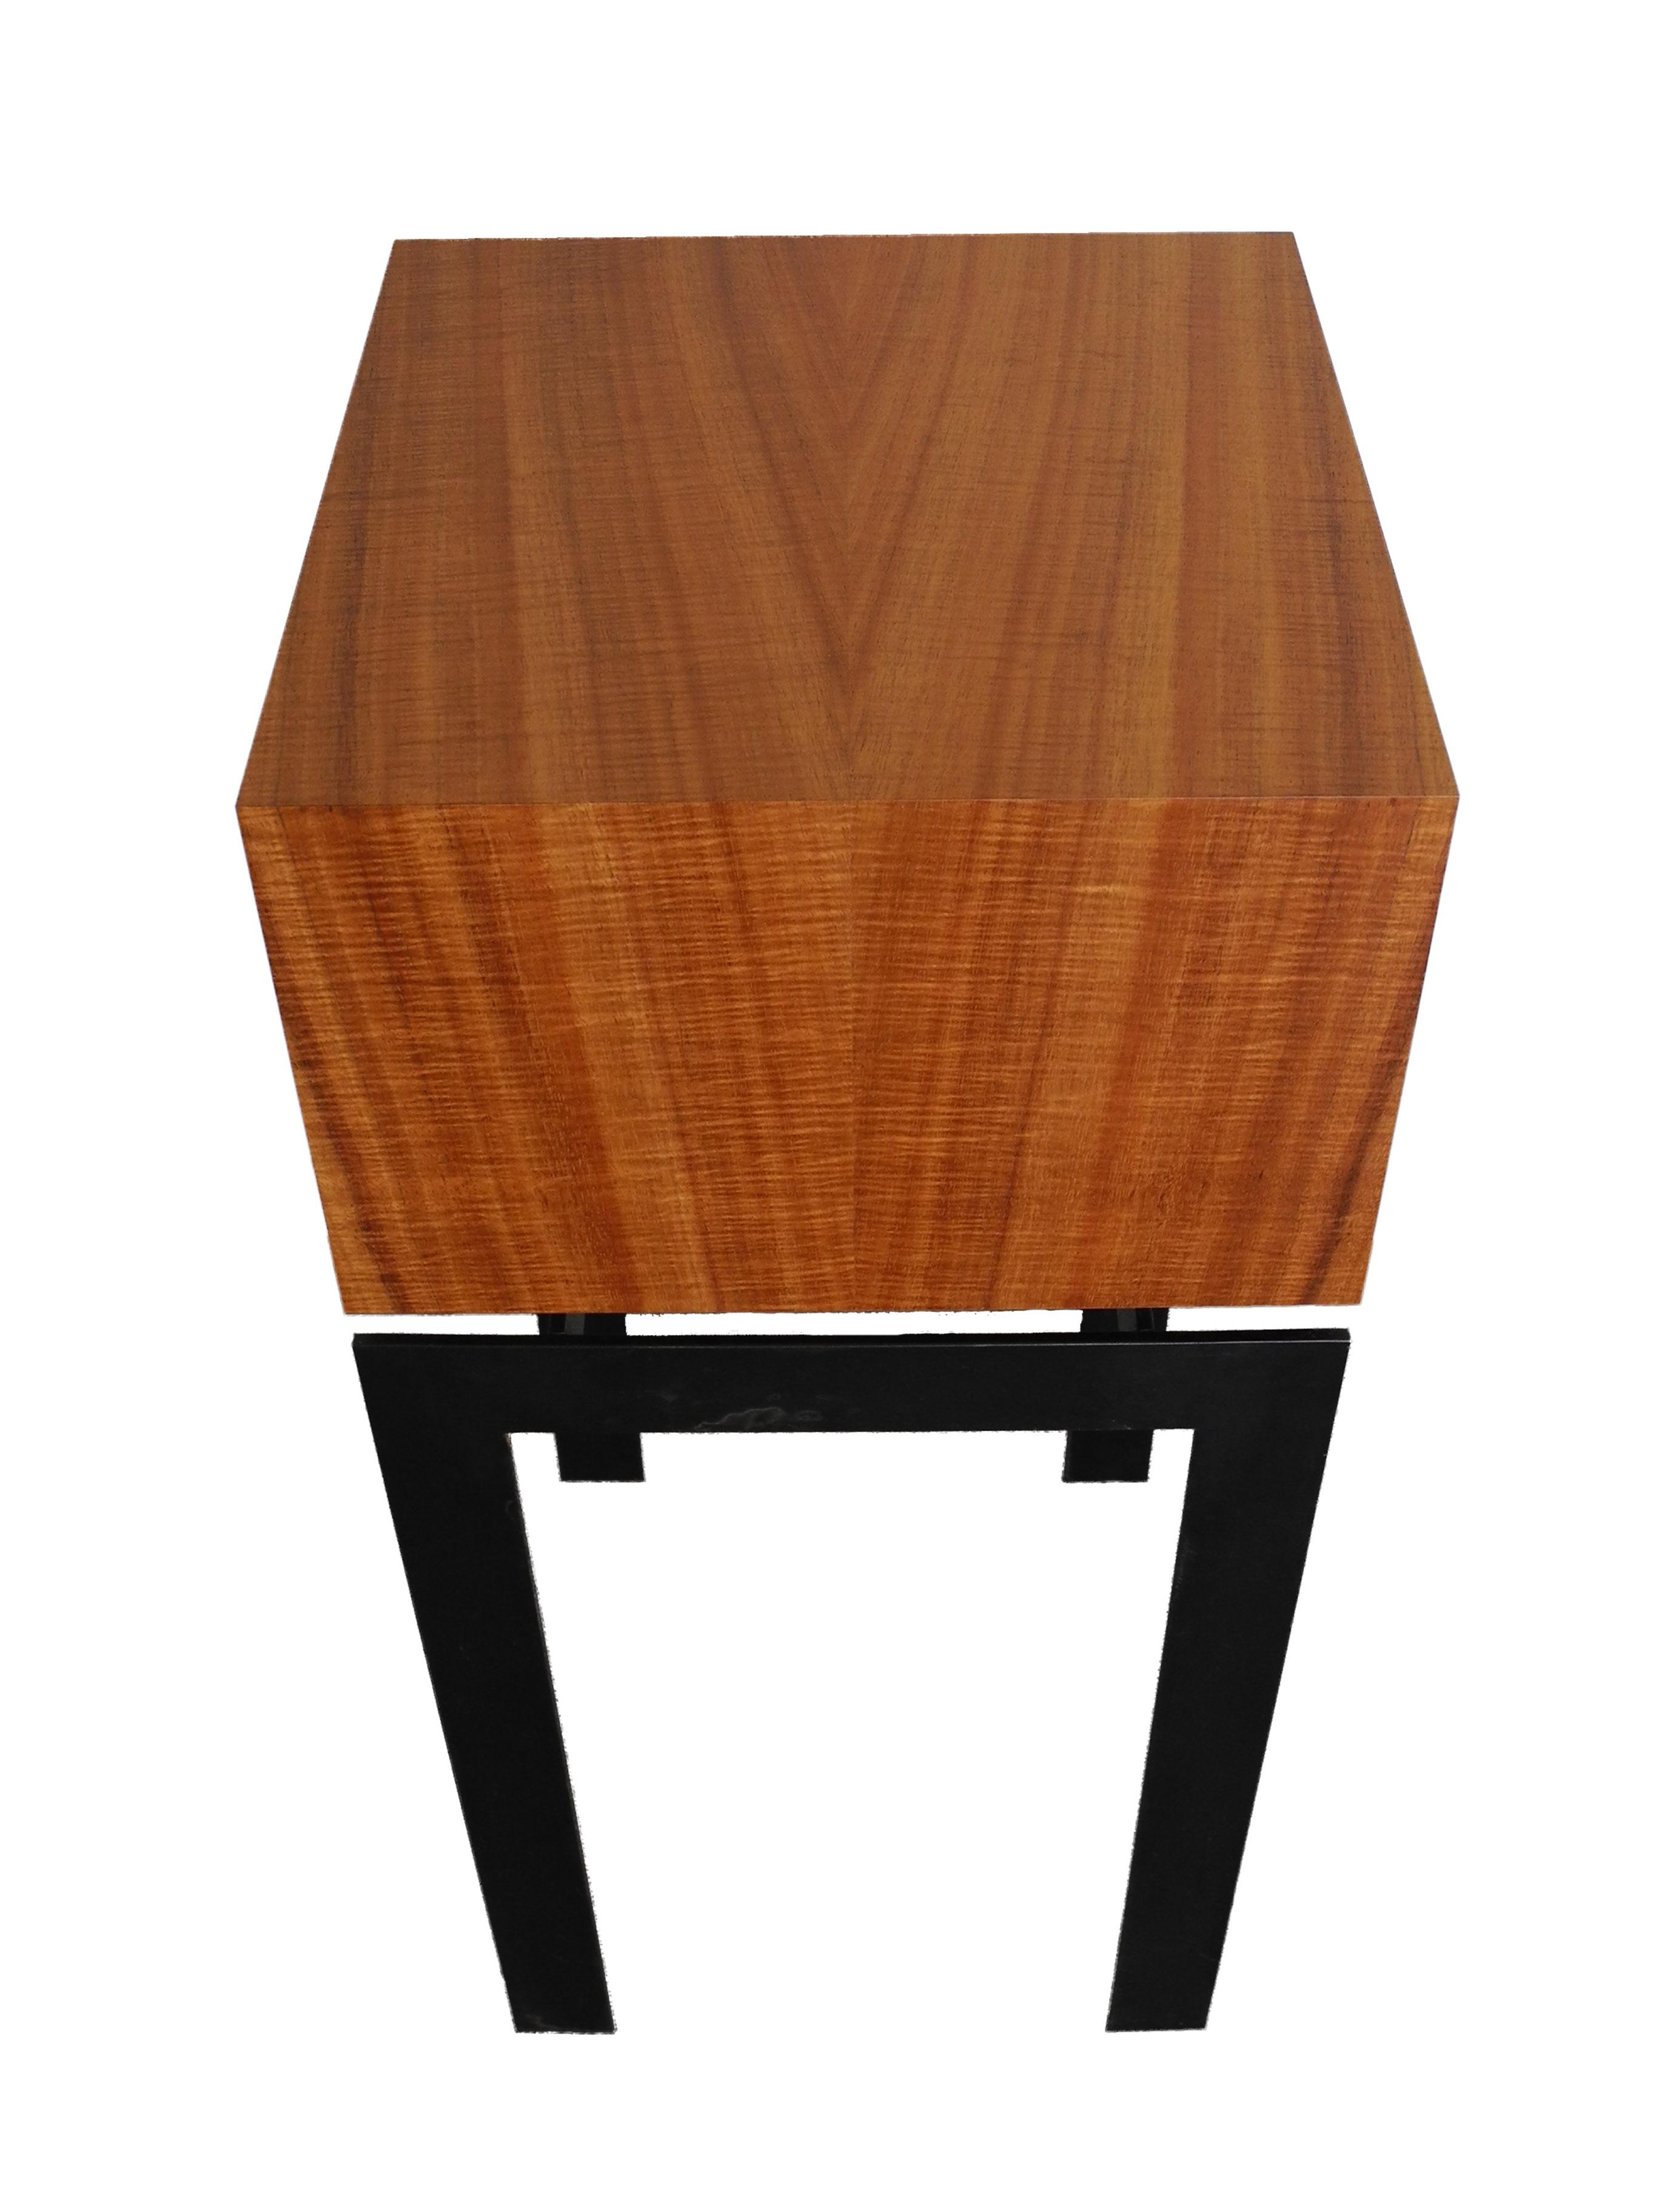 display pedestal end table square koa wood